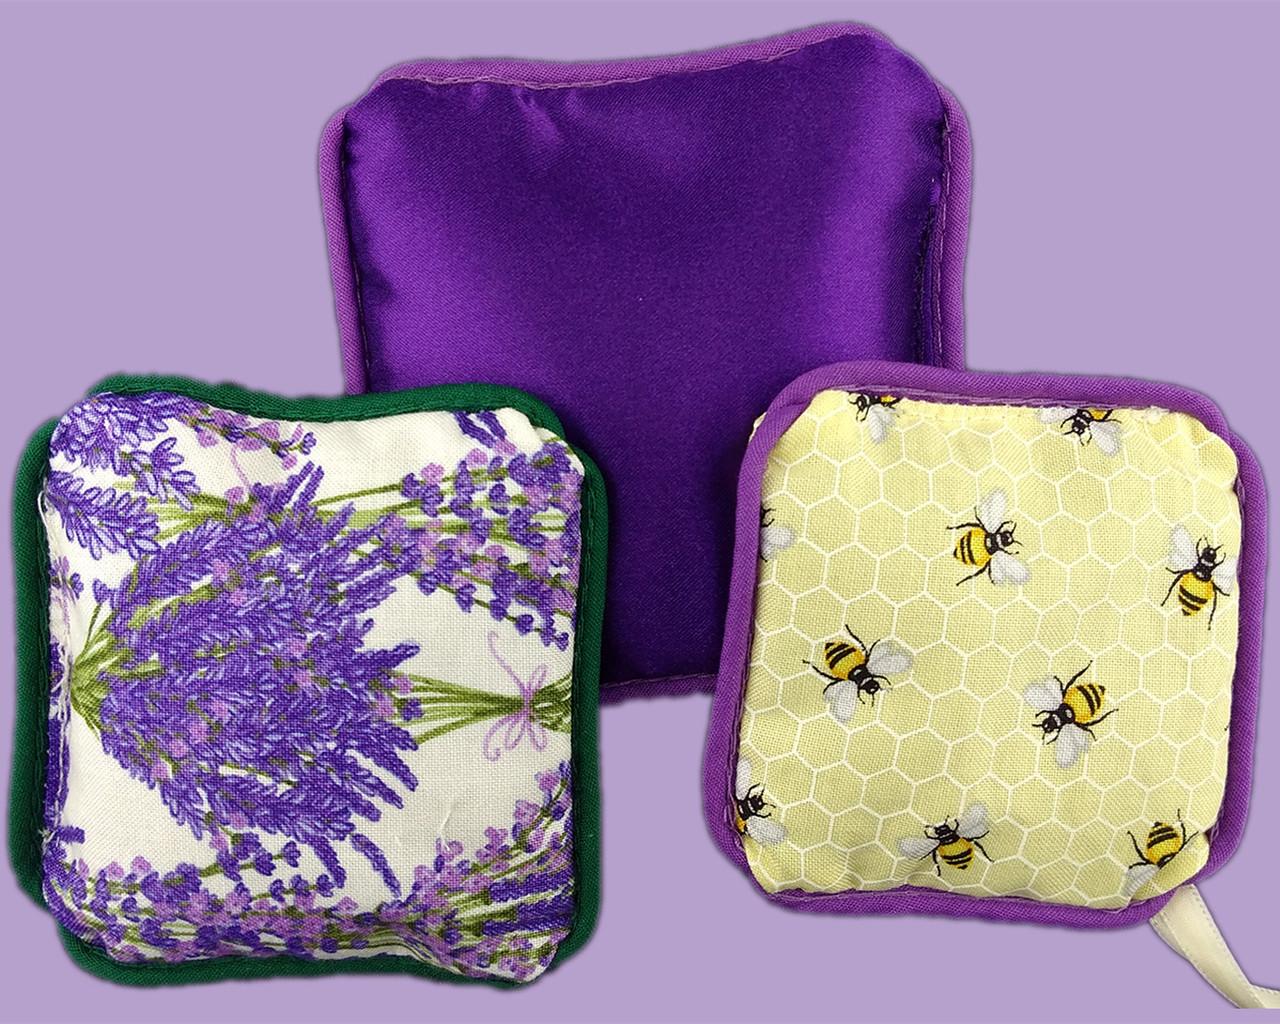 Lavender Sachets - Floral Pack